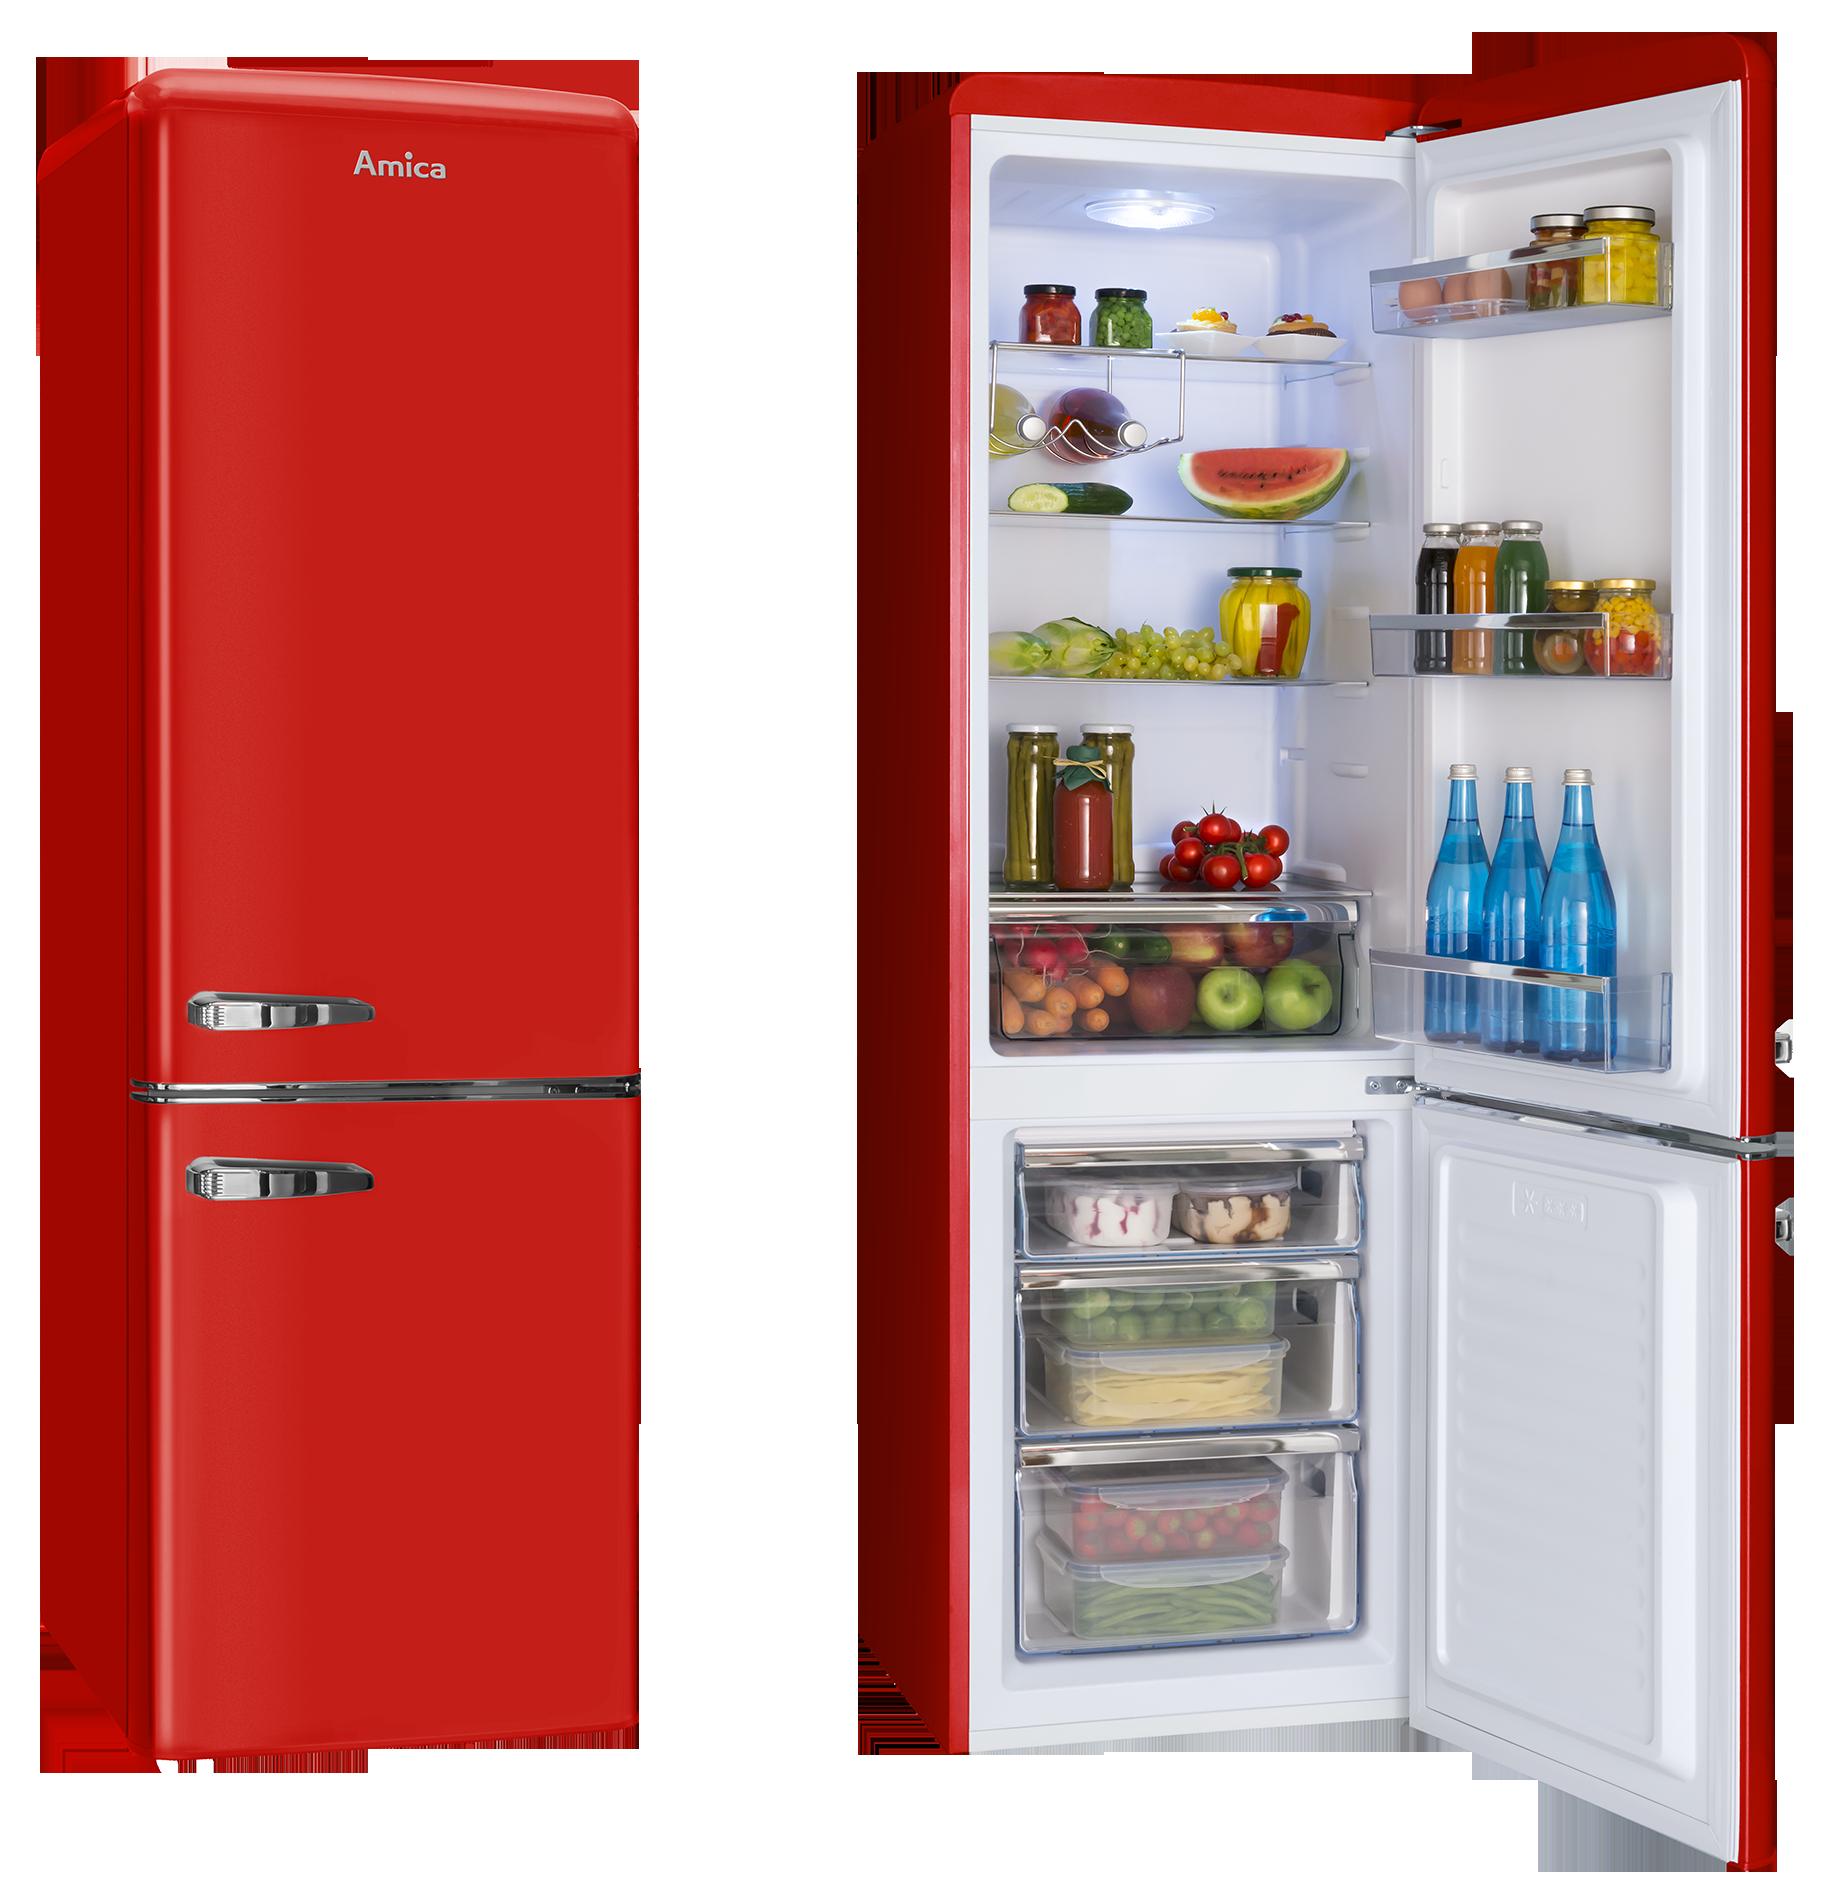 FK2965.3RAA - Prostostoječi hladilnik